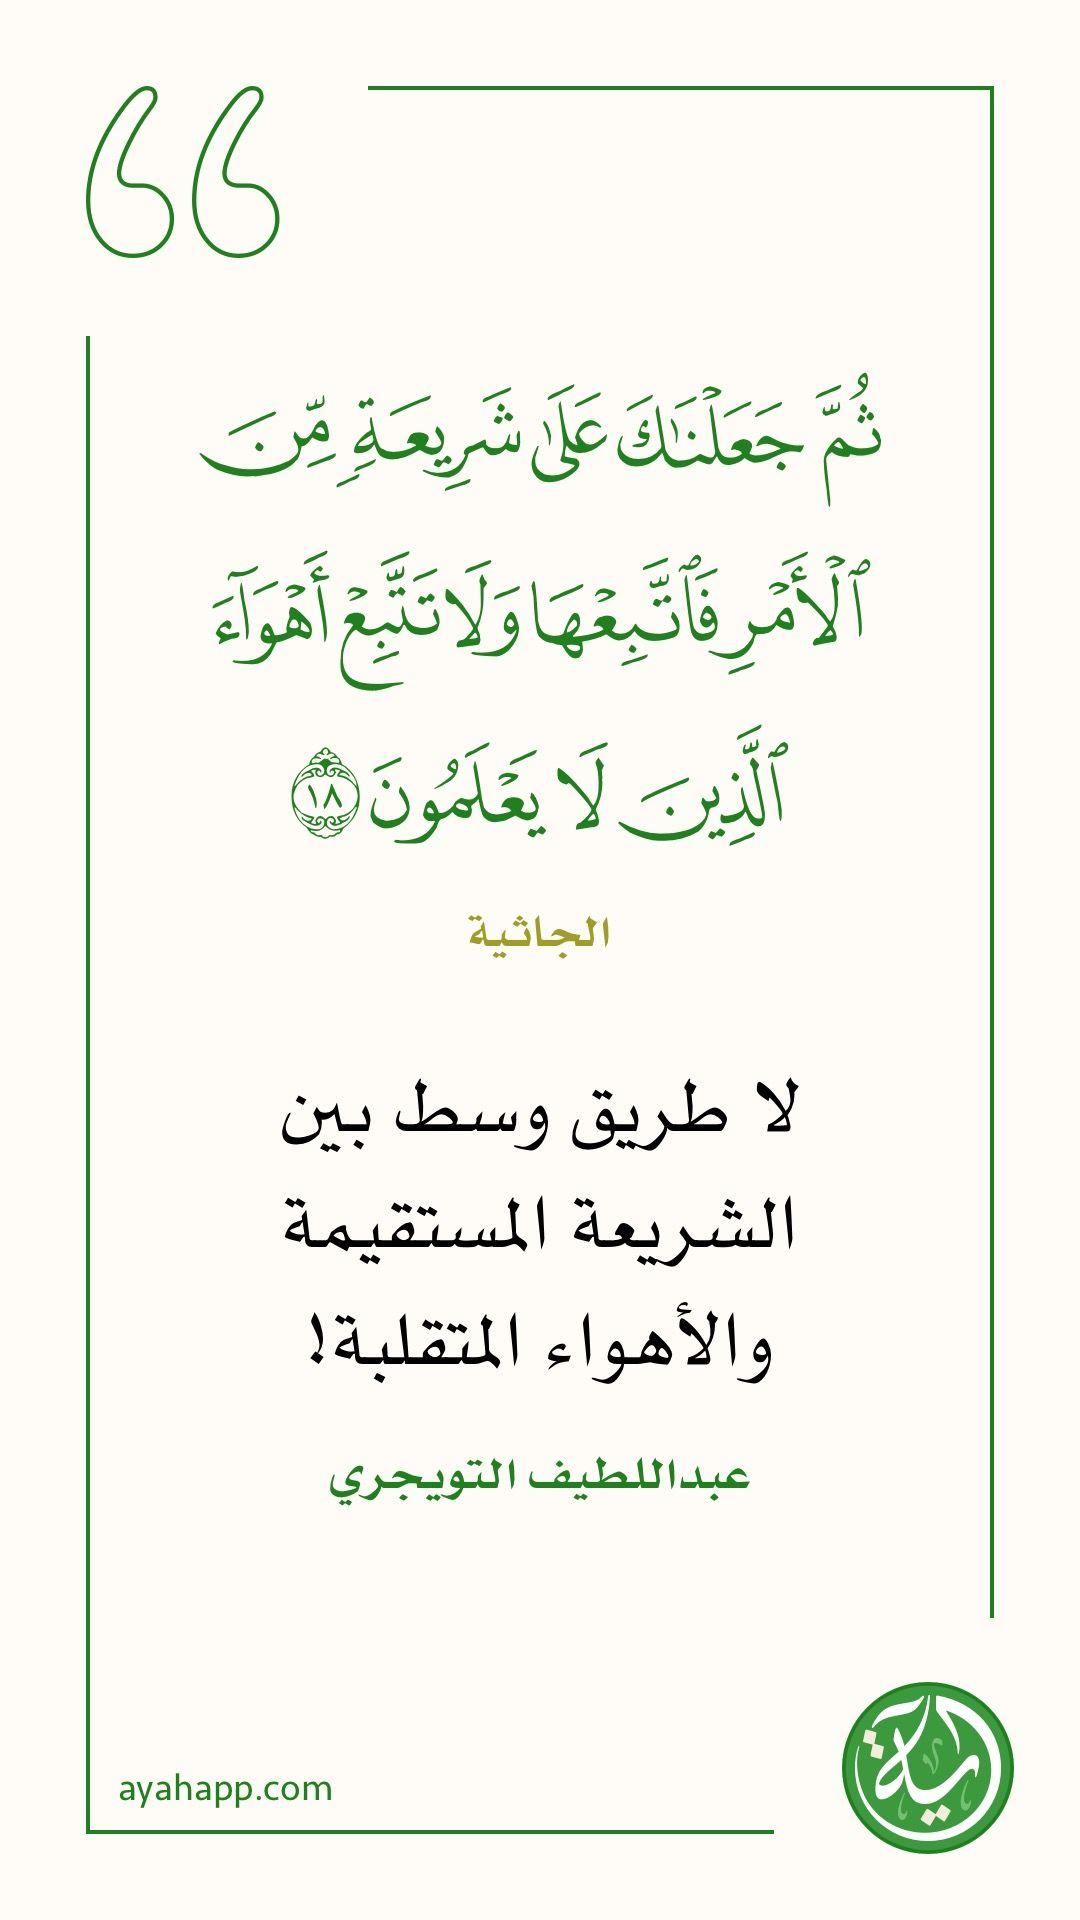 Pin By محبة الخير On بالقرآن نحيا Learn Islam Islamic Information Quotes